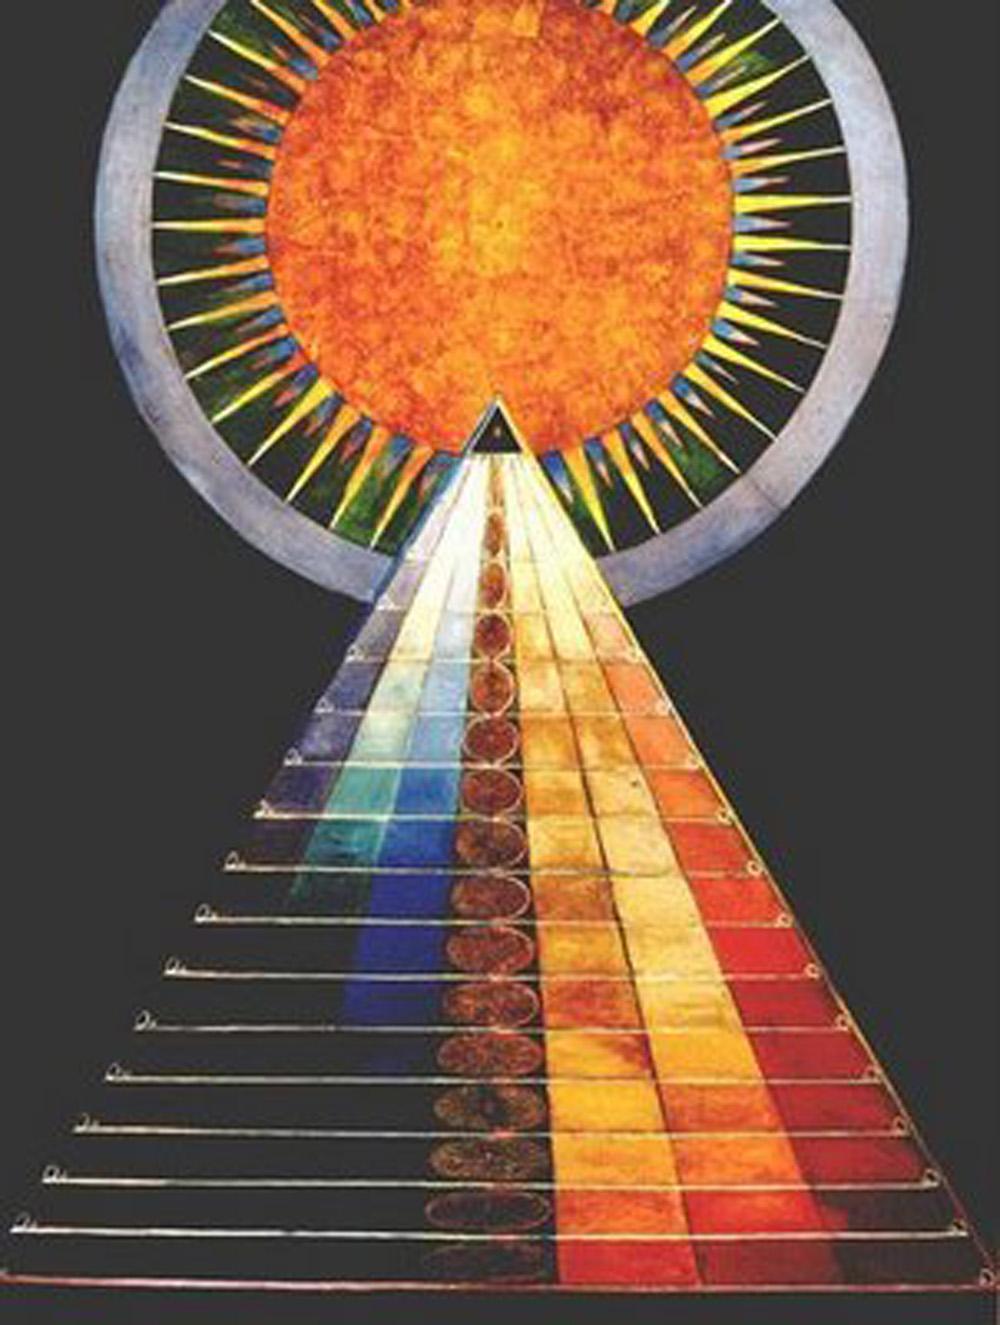 Hilma af Klint Grupp 10 Altarbilder Nr 1 LASTRATTISMO DI HILMA AF KLINT   mostra e capsule firmata Acne Studios